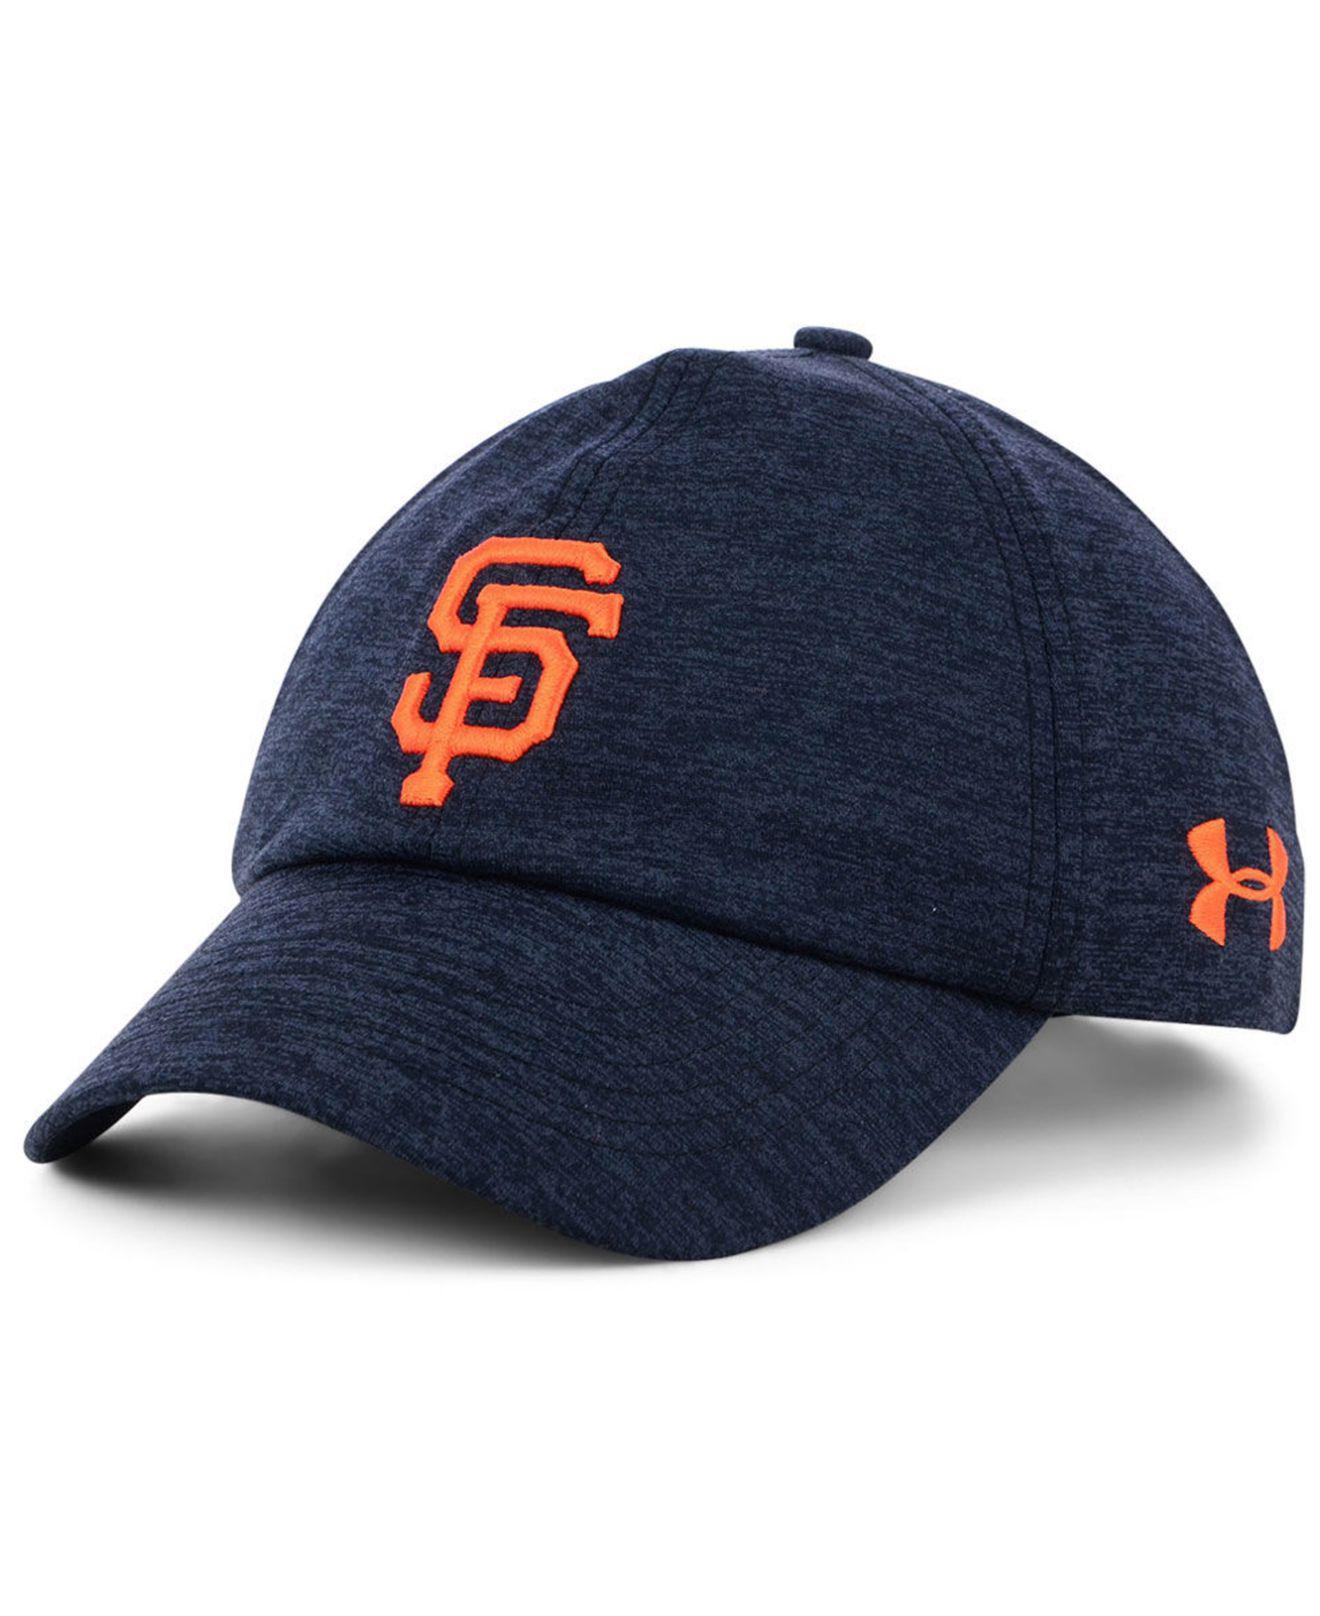 e01a042e141 ... mlb shadow airvent adjustable hat b0764 4ea25  discount code for under  armour. womens blue san francisco giants renegade twist cap 695e1 8ce86